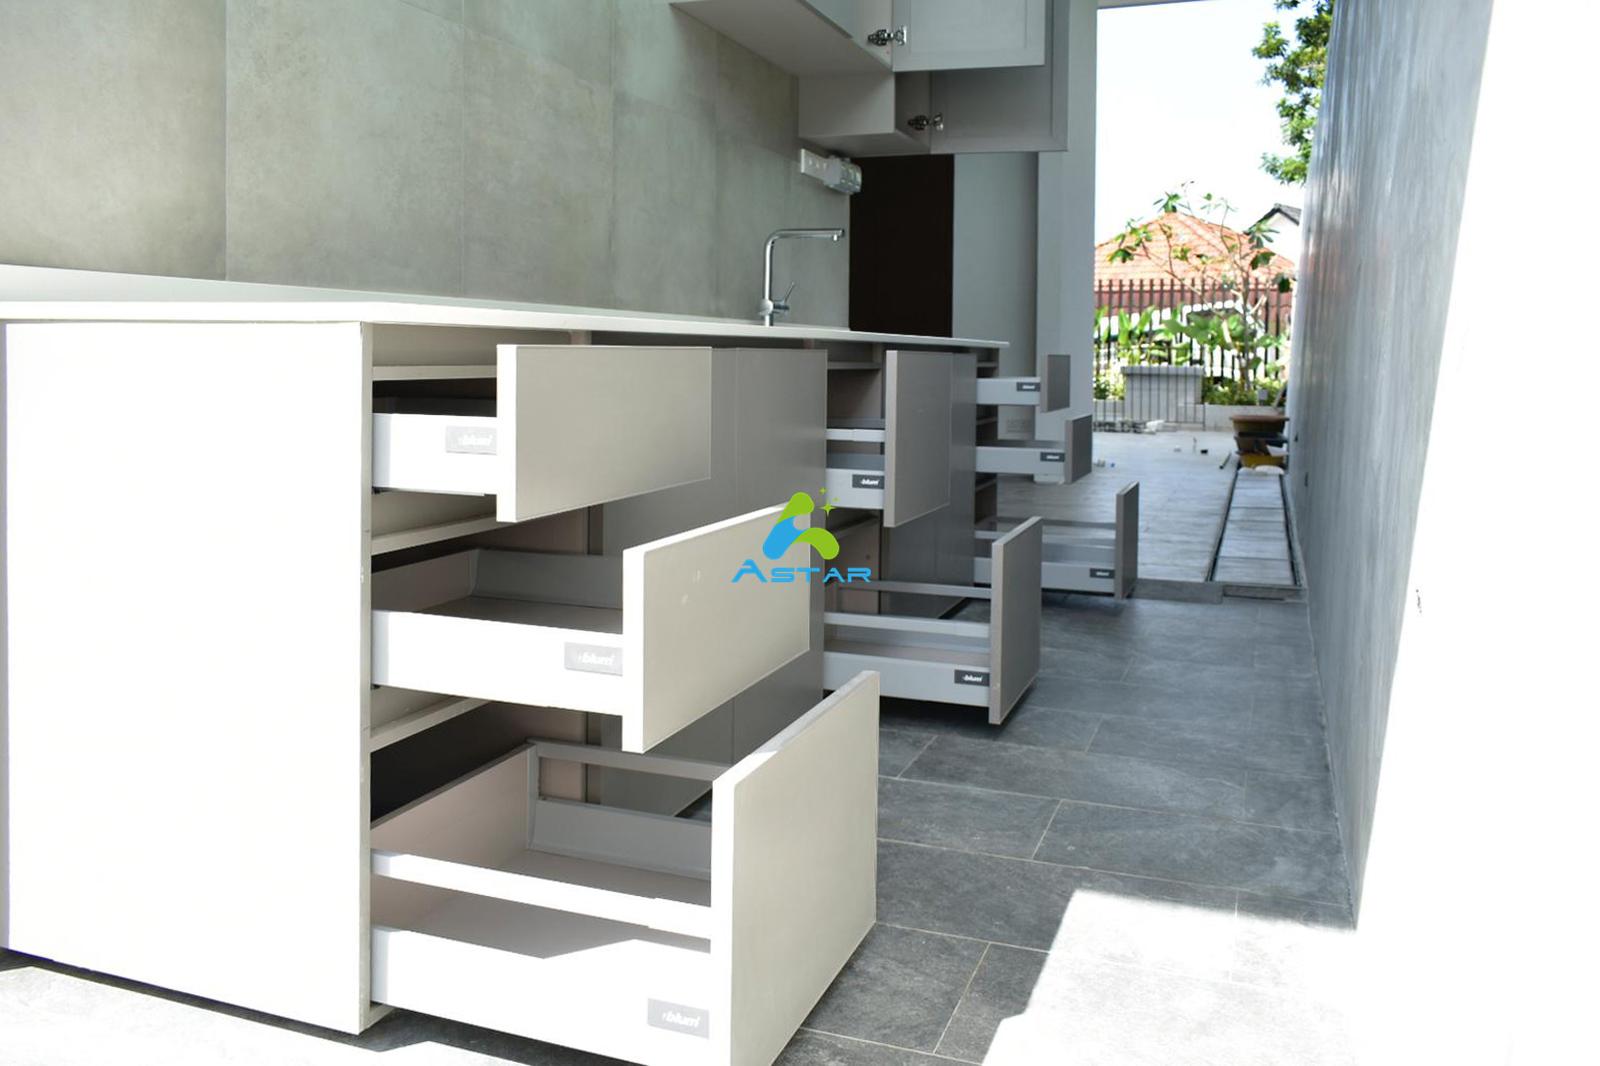 astar furnishing complete projects aluminium kitchen cabinet vanity cabinet wardrobe gardenia road 05